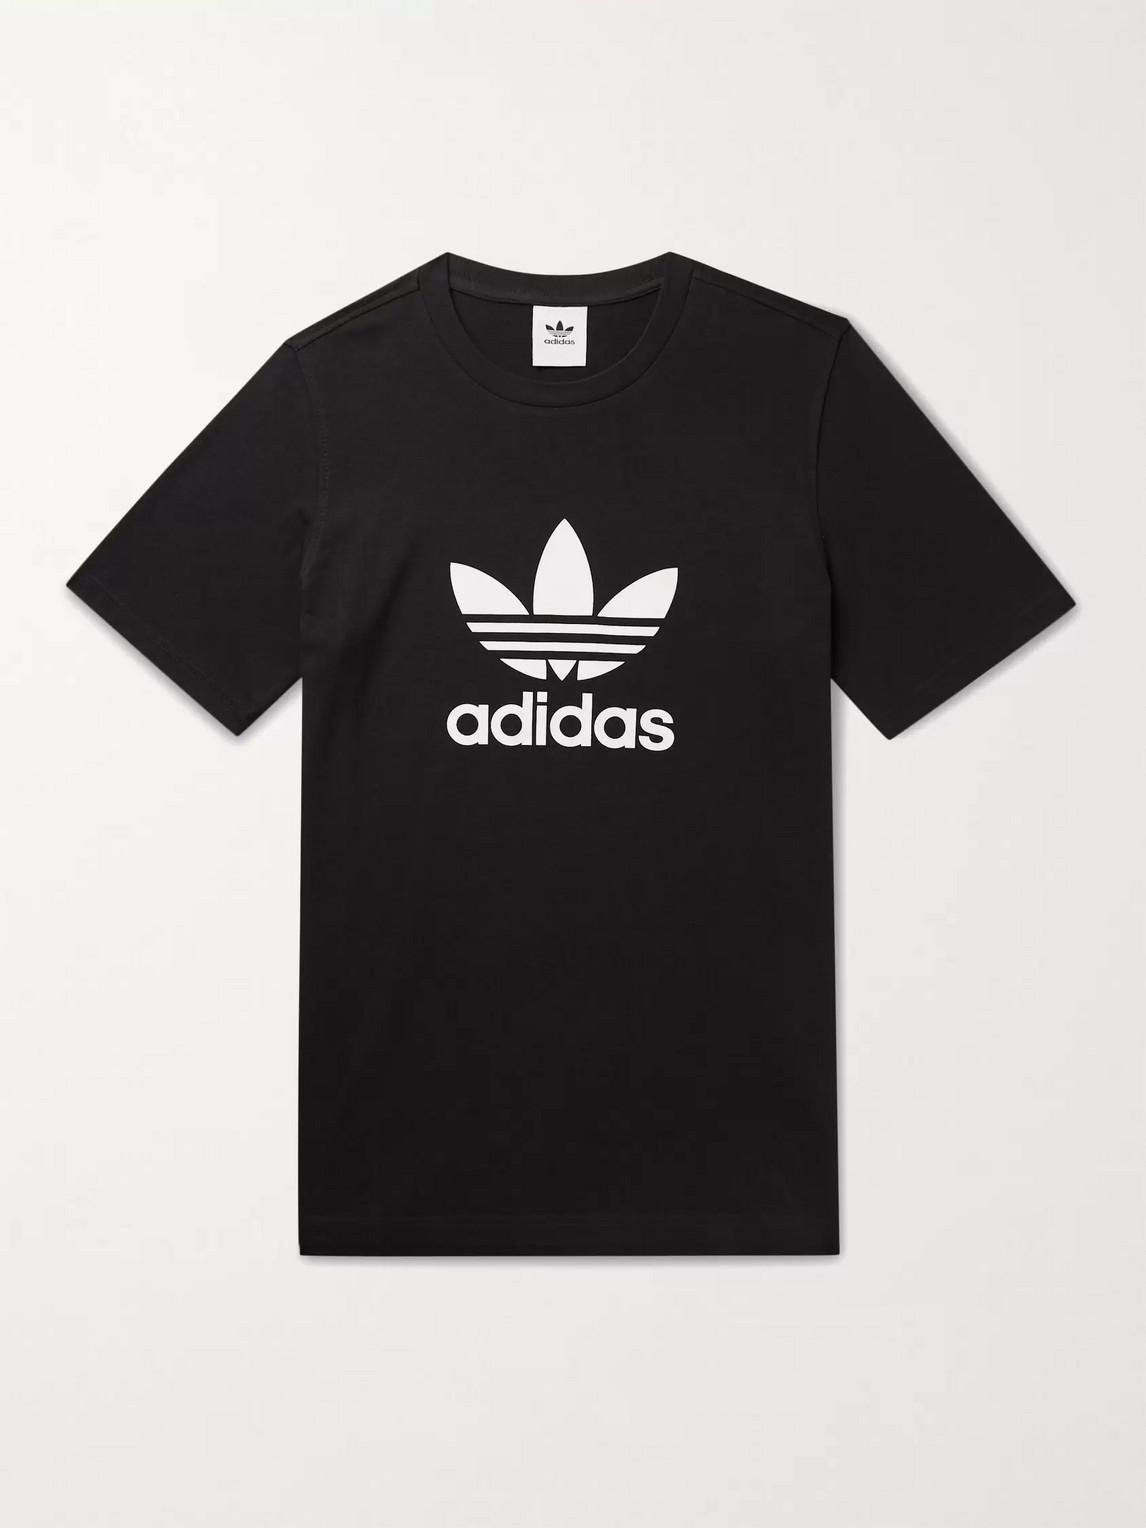 Adidas Originals Logo-print Cotton-jersey T-shirt In Black/white